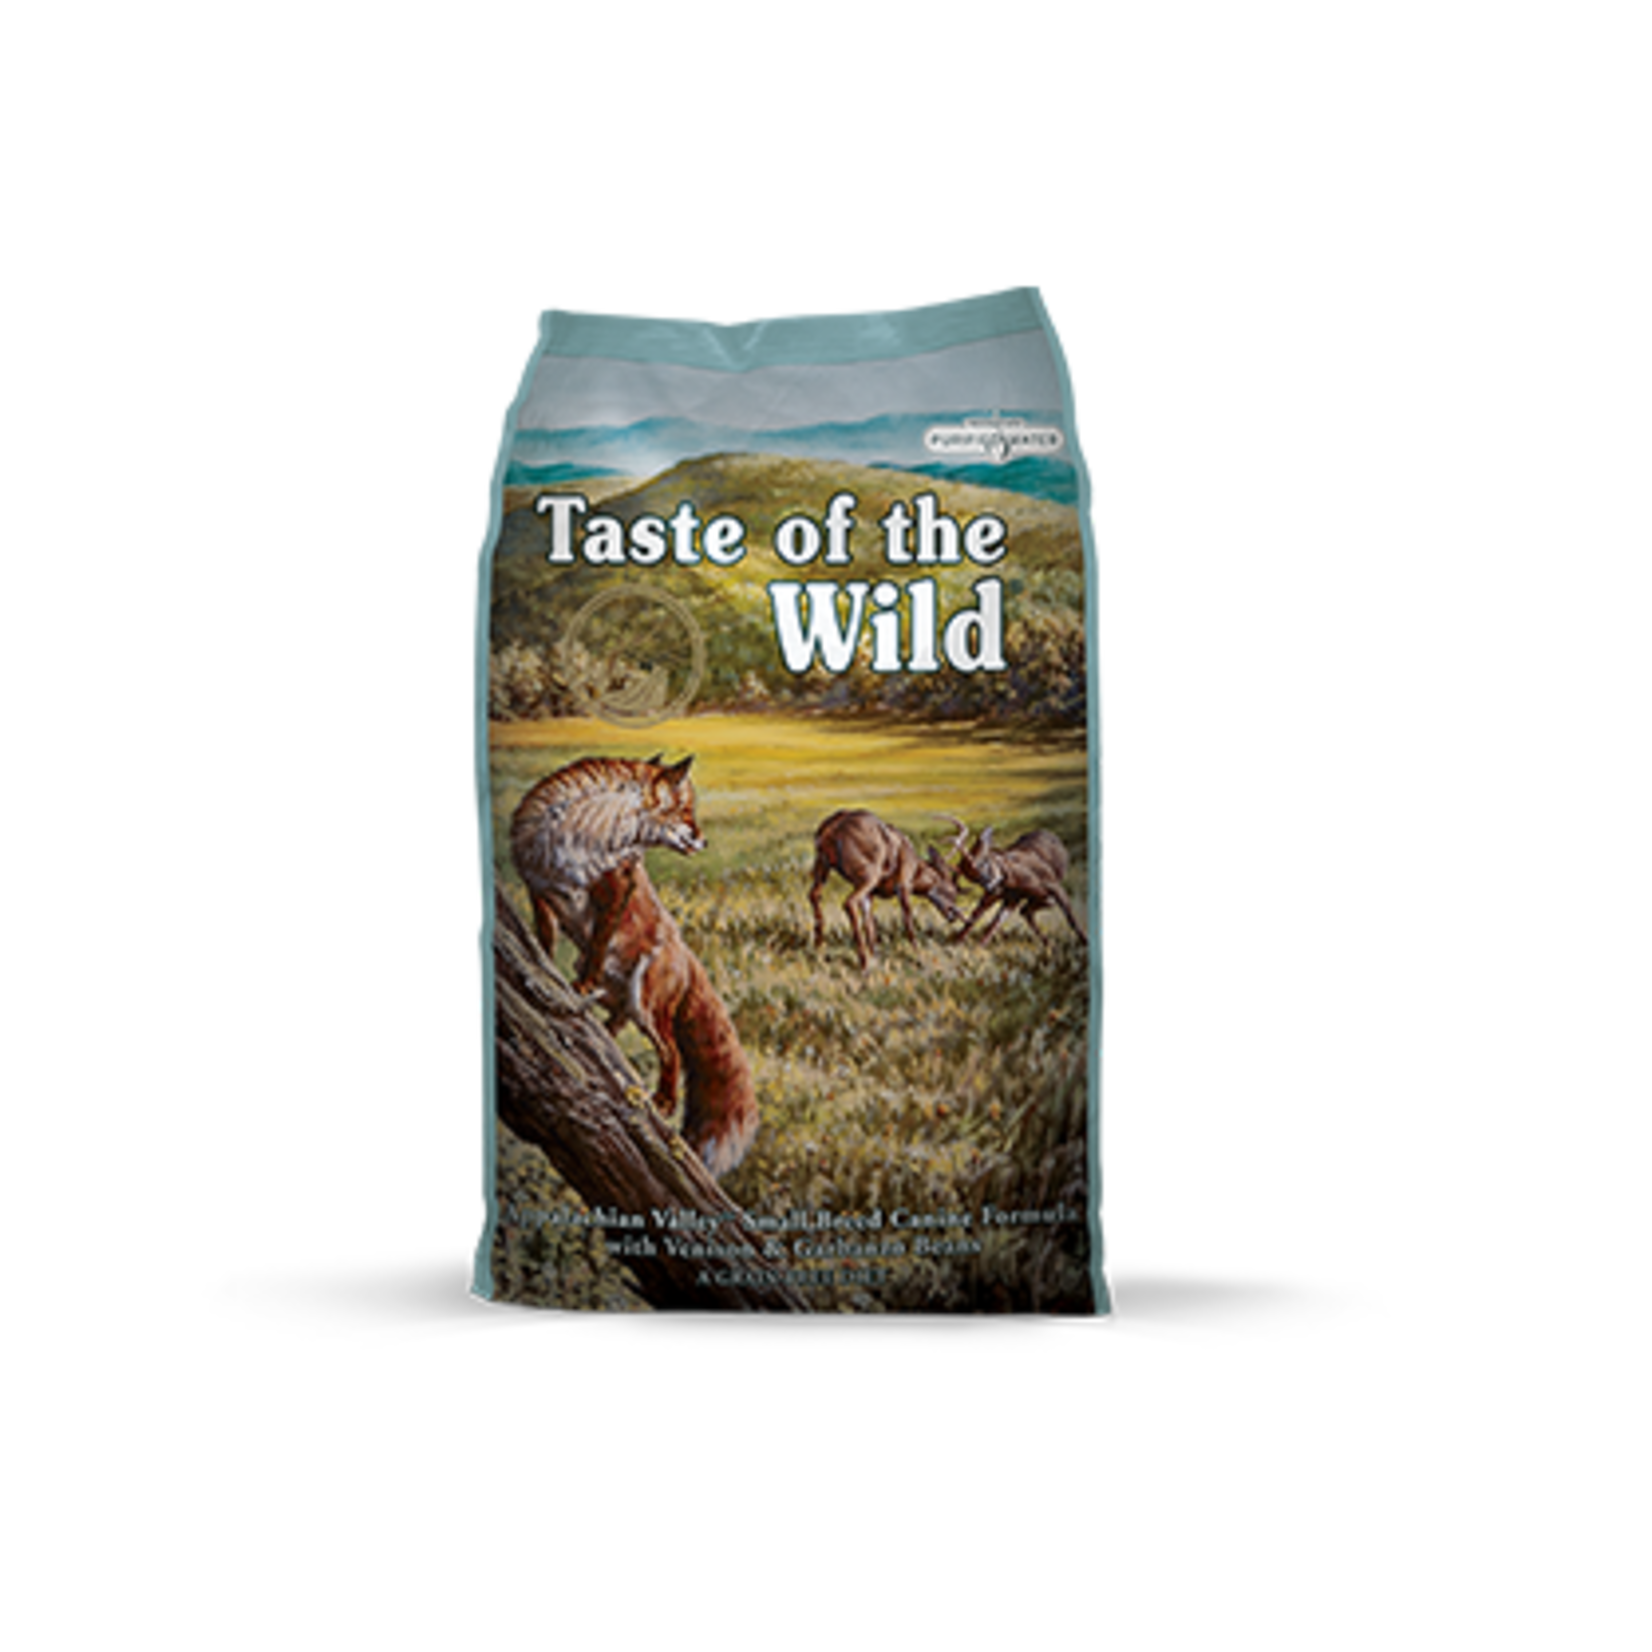 Taste of the Wild Taste of the Wild Appalachian Venison Small Breed Dog Food